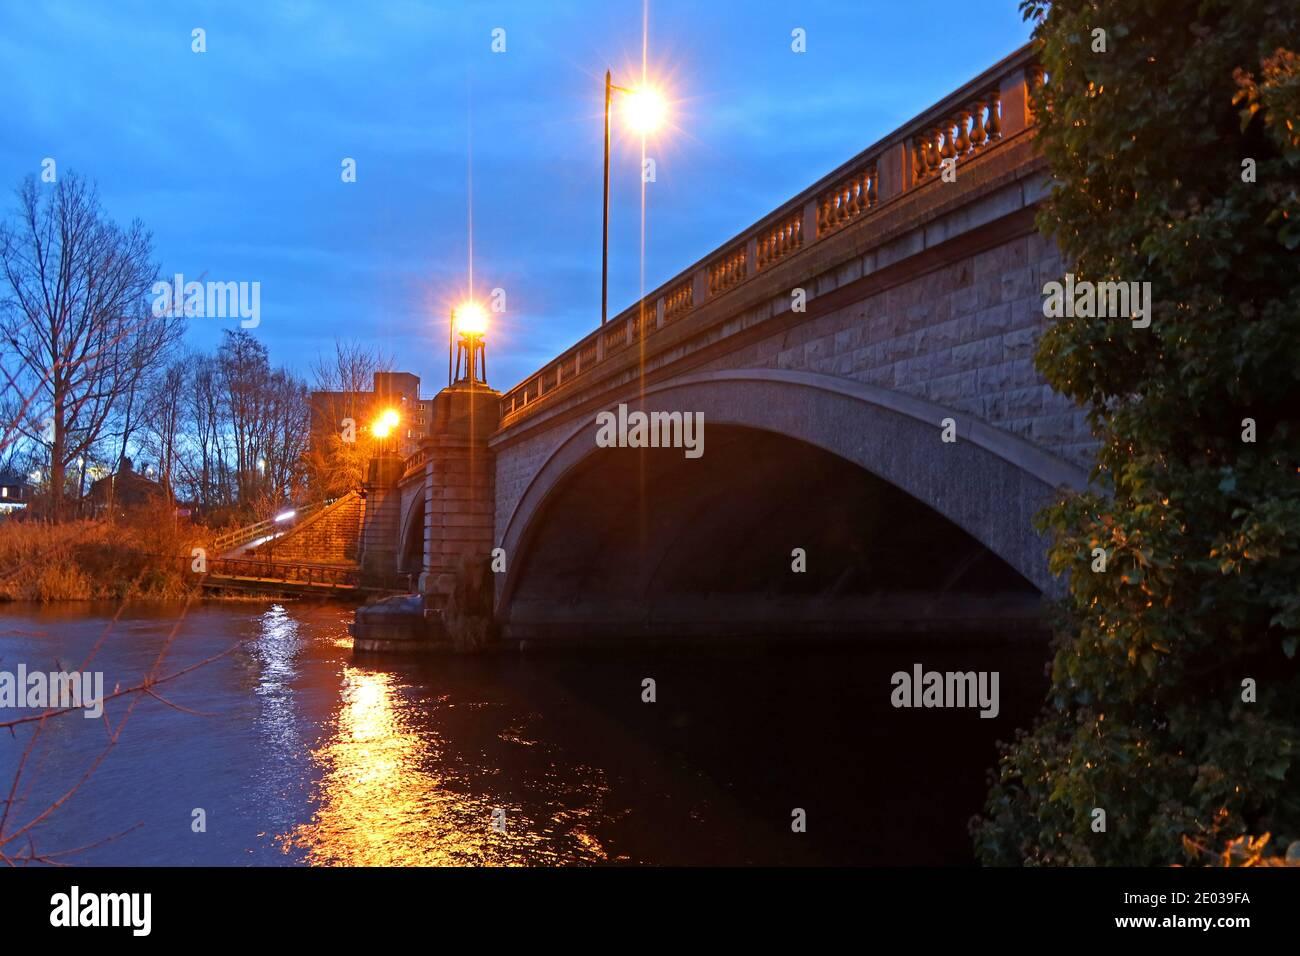 Warrington,Cheshire,England,UK,HotpixUK,@HotpixUK,GoTonySmith,crossing,A50,town centre,5 December 1934,05/12/1934,king,George,V,fifth,WA1,dusk,night,night time,evening,in the